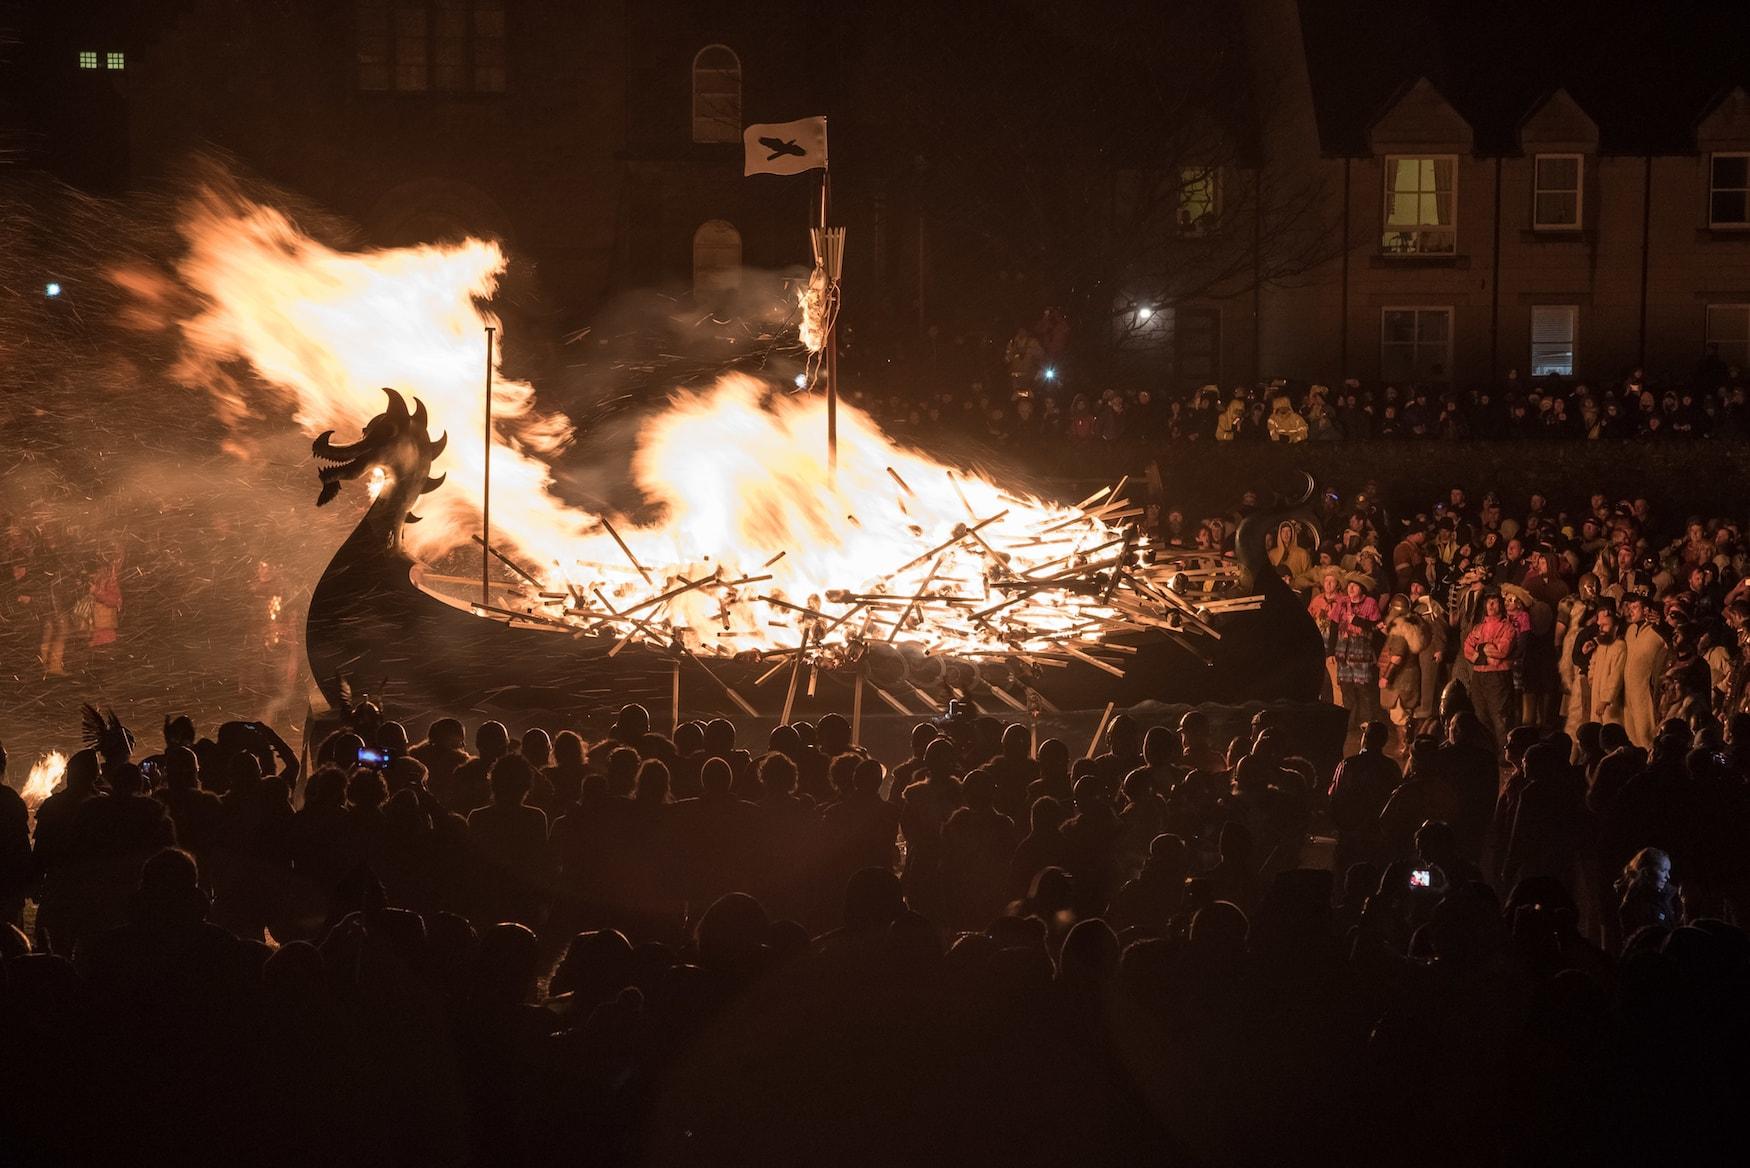 Galere brennt ab beim Festival